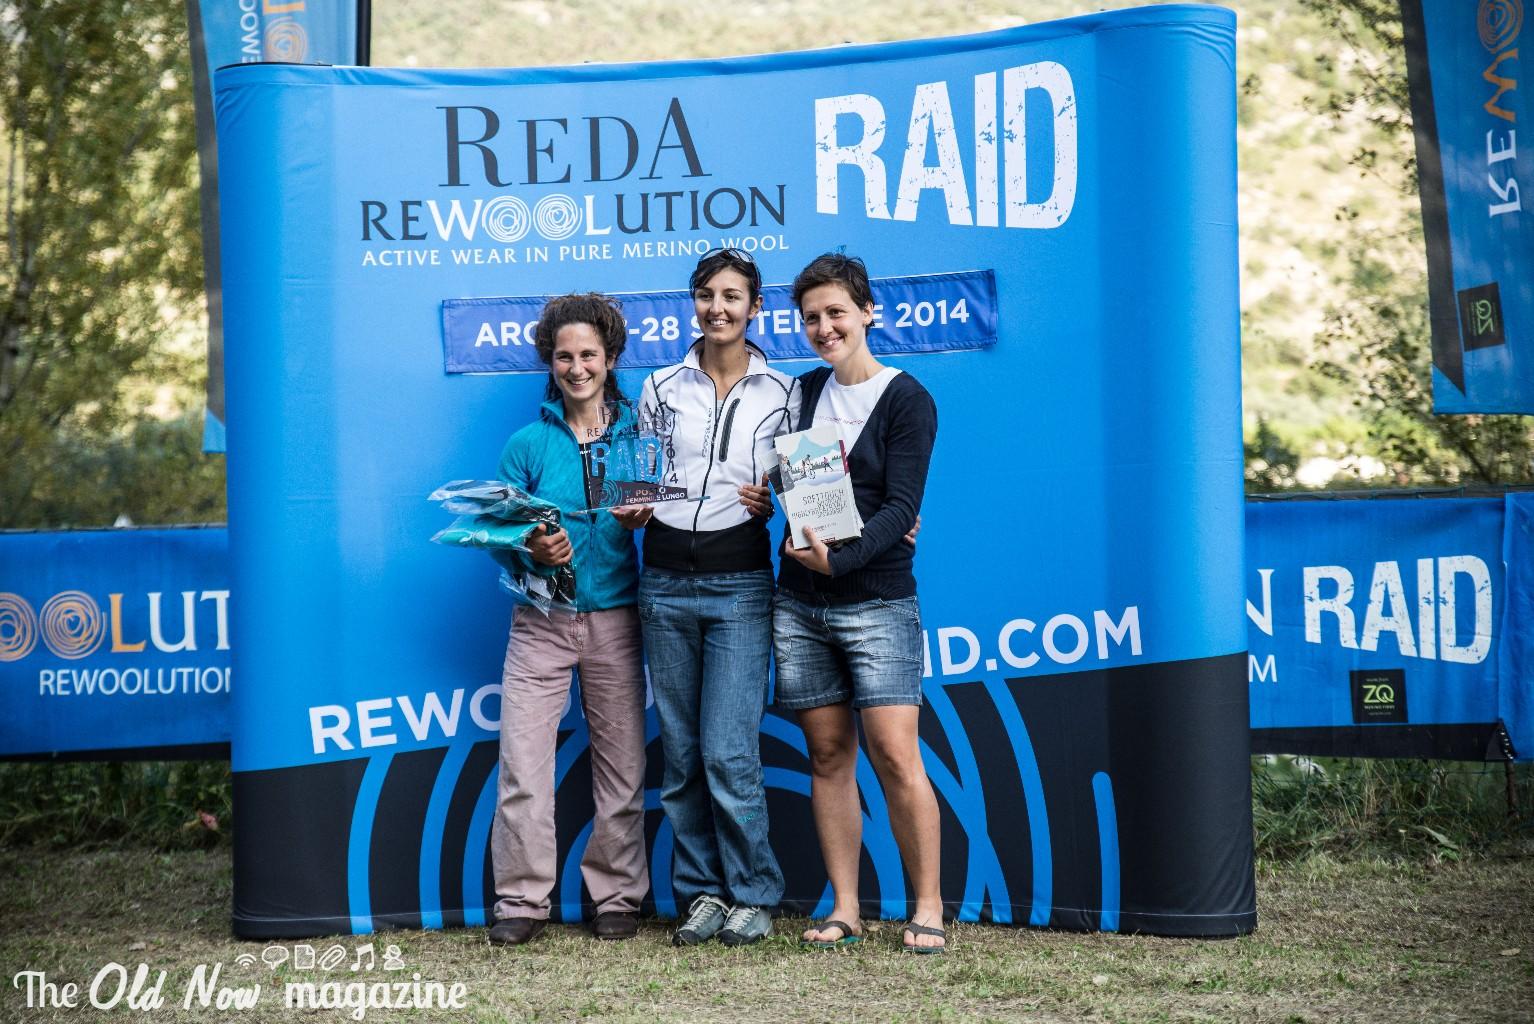 Reda Rewoolution Raid (24)